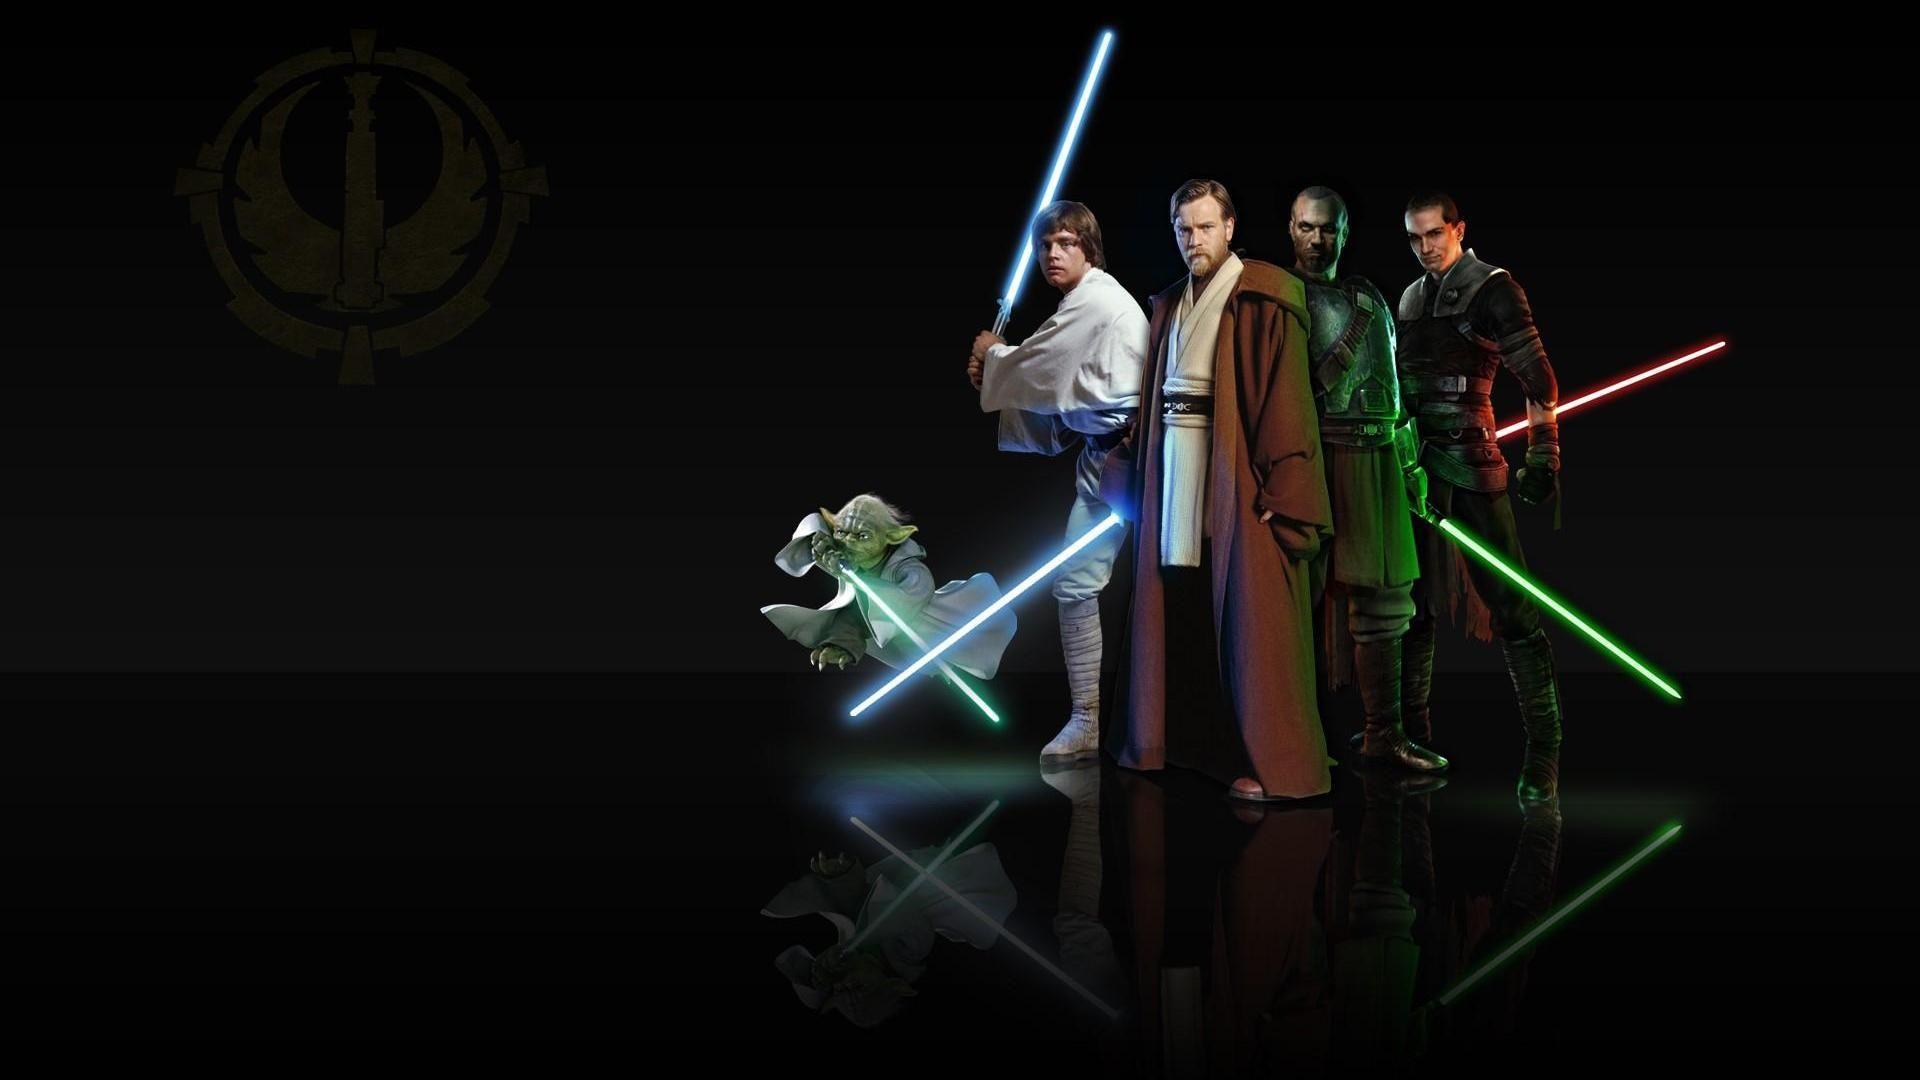 Star Wars Light Wallpapers Top Free Star Wars Light Backgrounds Wallpaperaccess